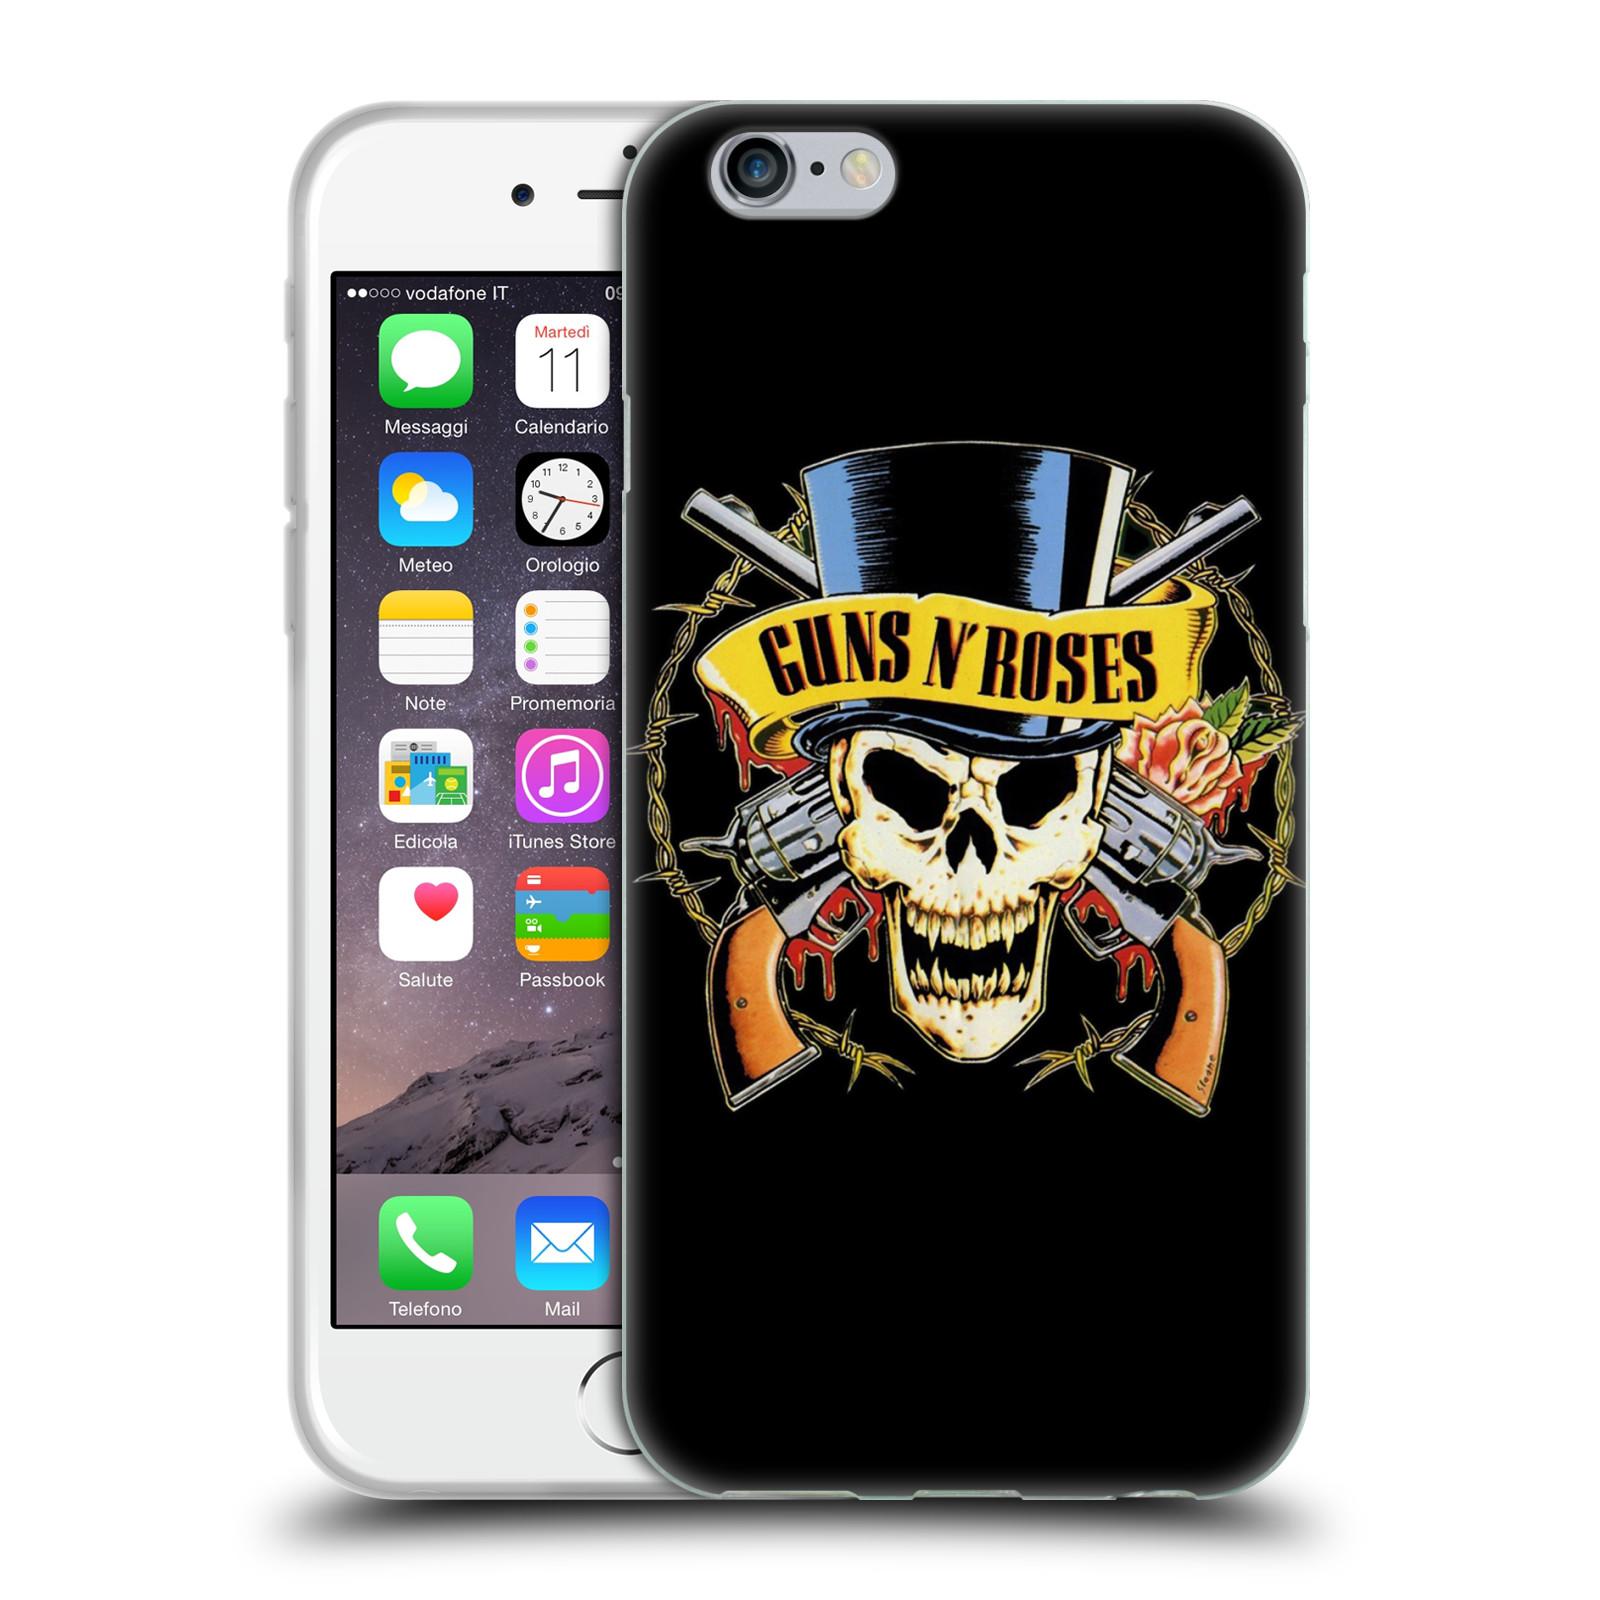 Silikonové pouzdro na mobil Apple iPhone 6 HEAD CASE Guns N' Roses - Lebka